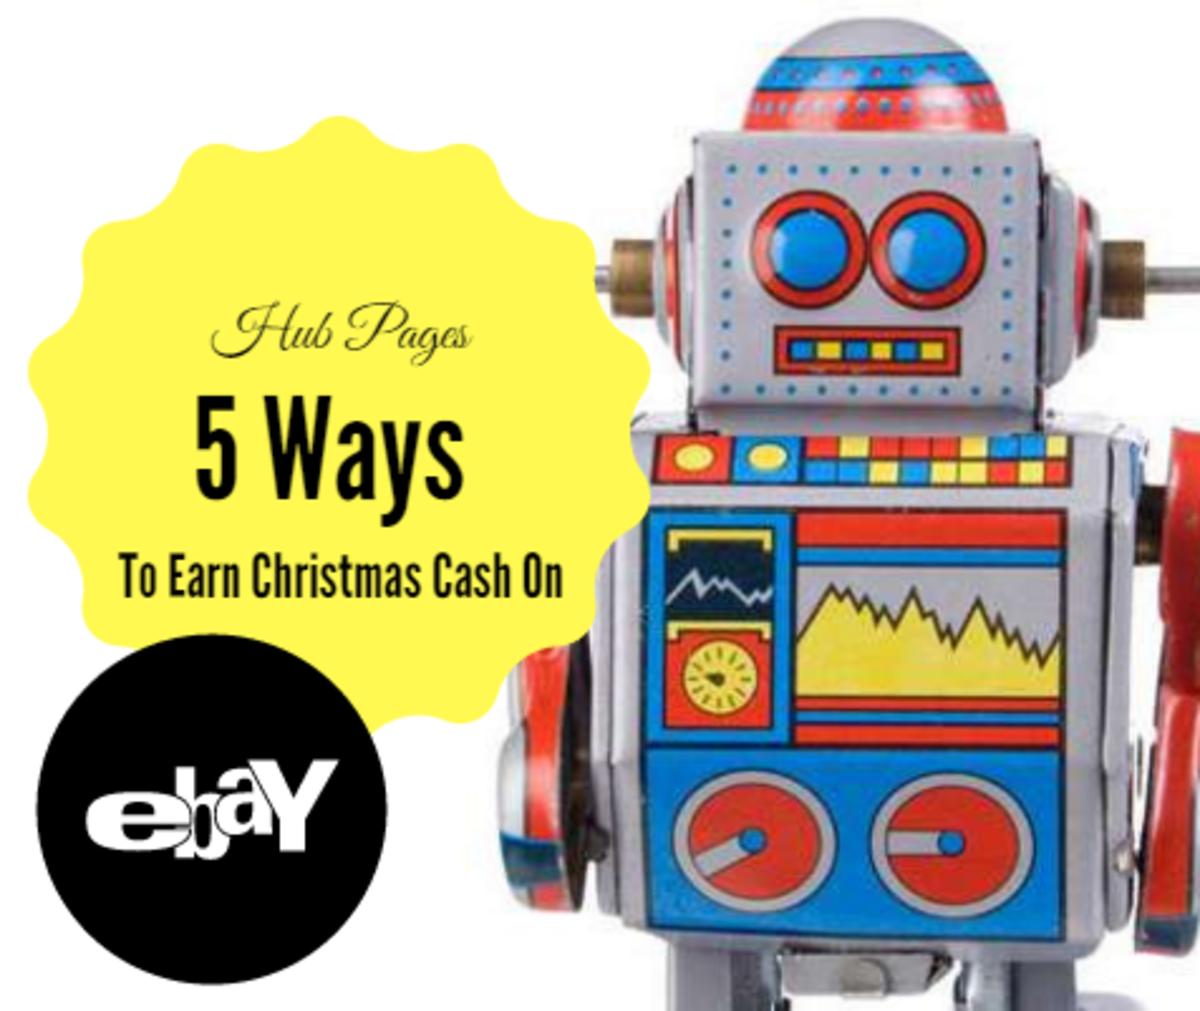 5 Ways to Earn Christmas Cash on eBay